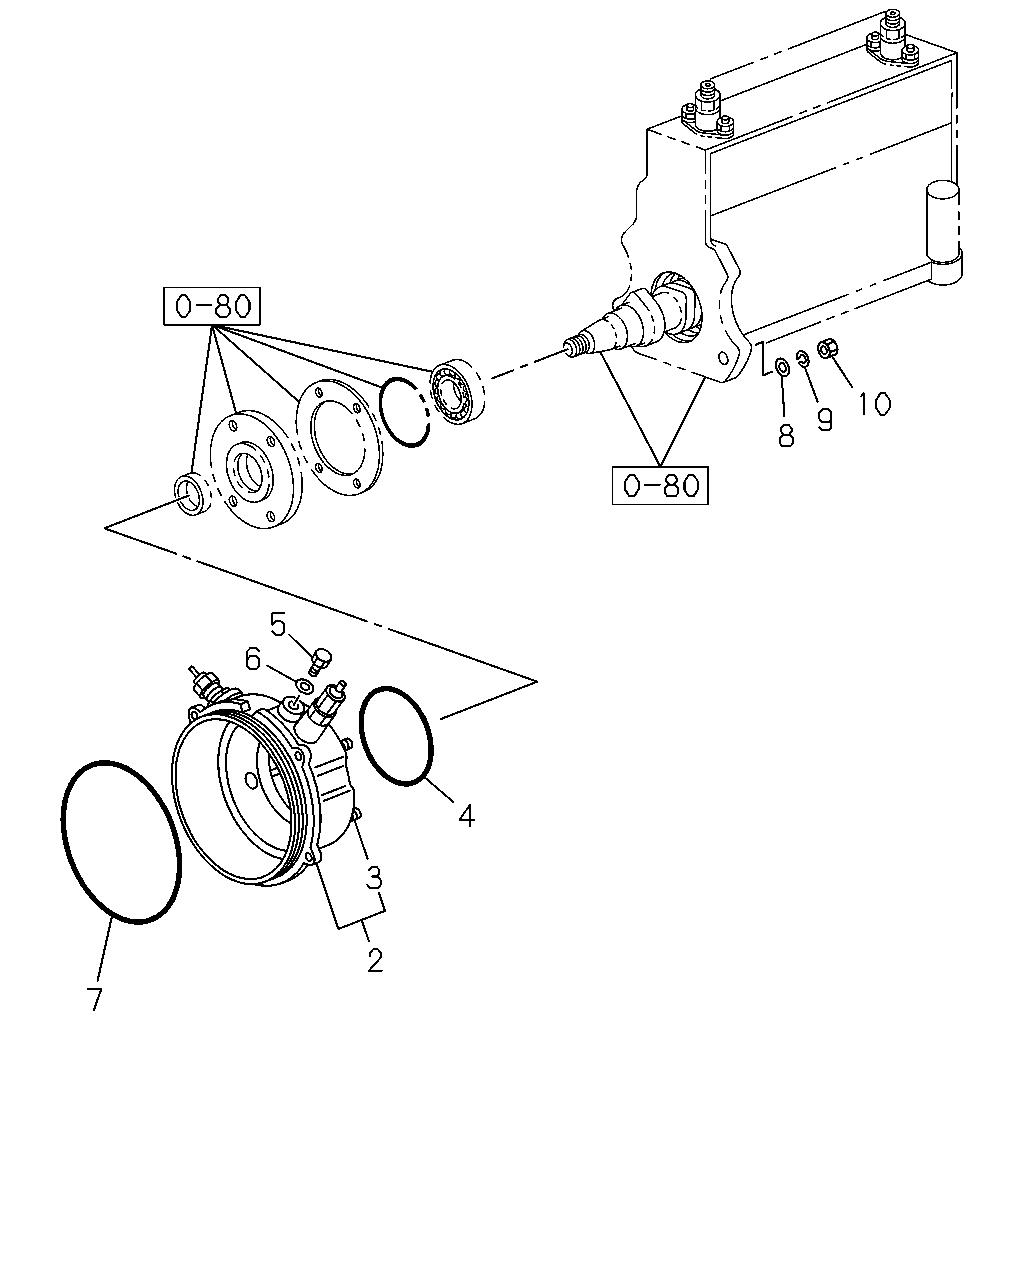 Lv 10772 Lv280 Thai 97 0 Engine Emission Engine Electrical 0 86 Miscellaneous Parts Injection Pump Catcar Info